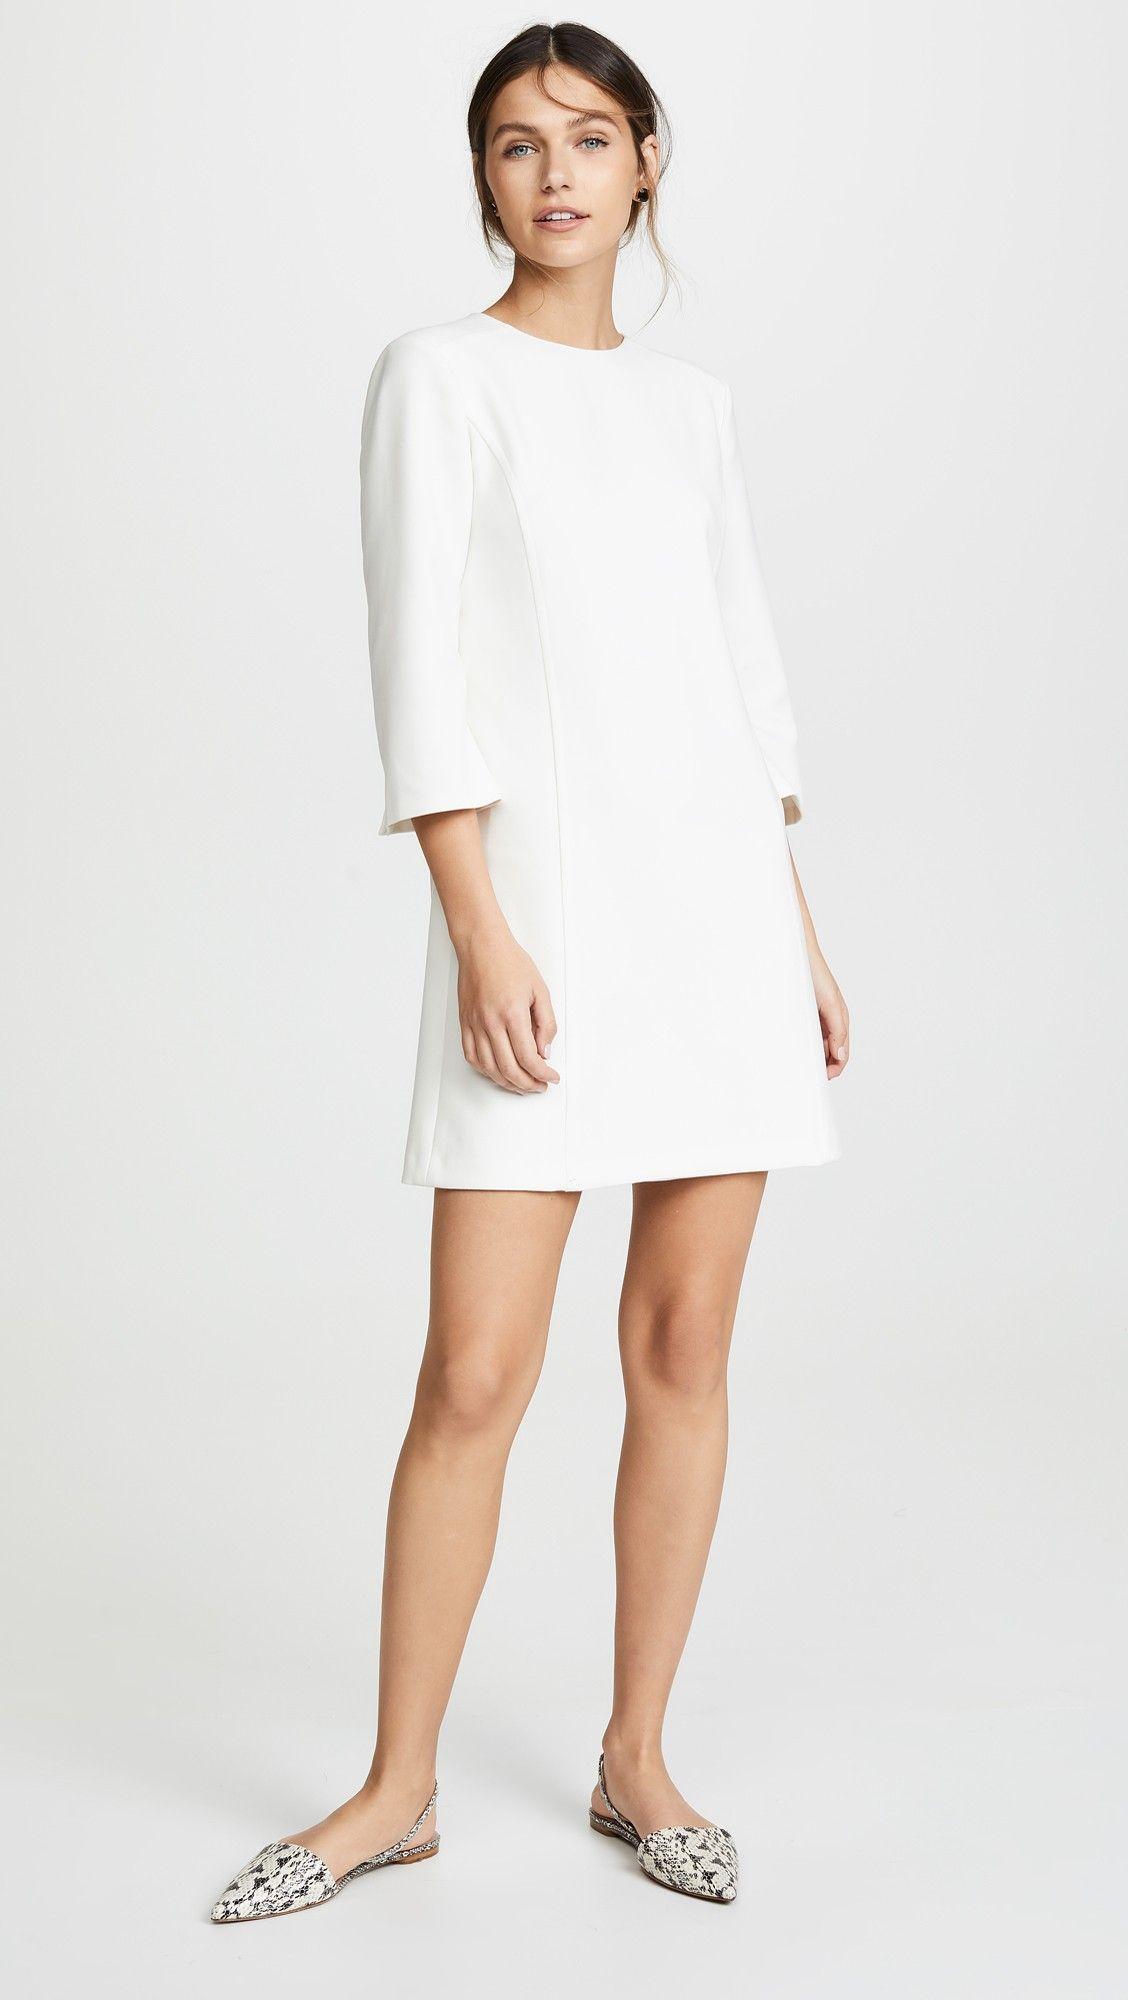 Alice Olivia Gem 3 4 Sleeve Shift Dress Shift Dress Day To Night Dresses White Shift Dresses [ 2000 x 1128 Pixel ]